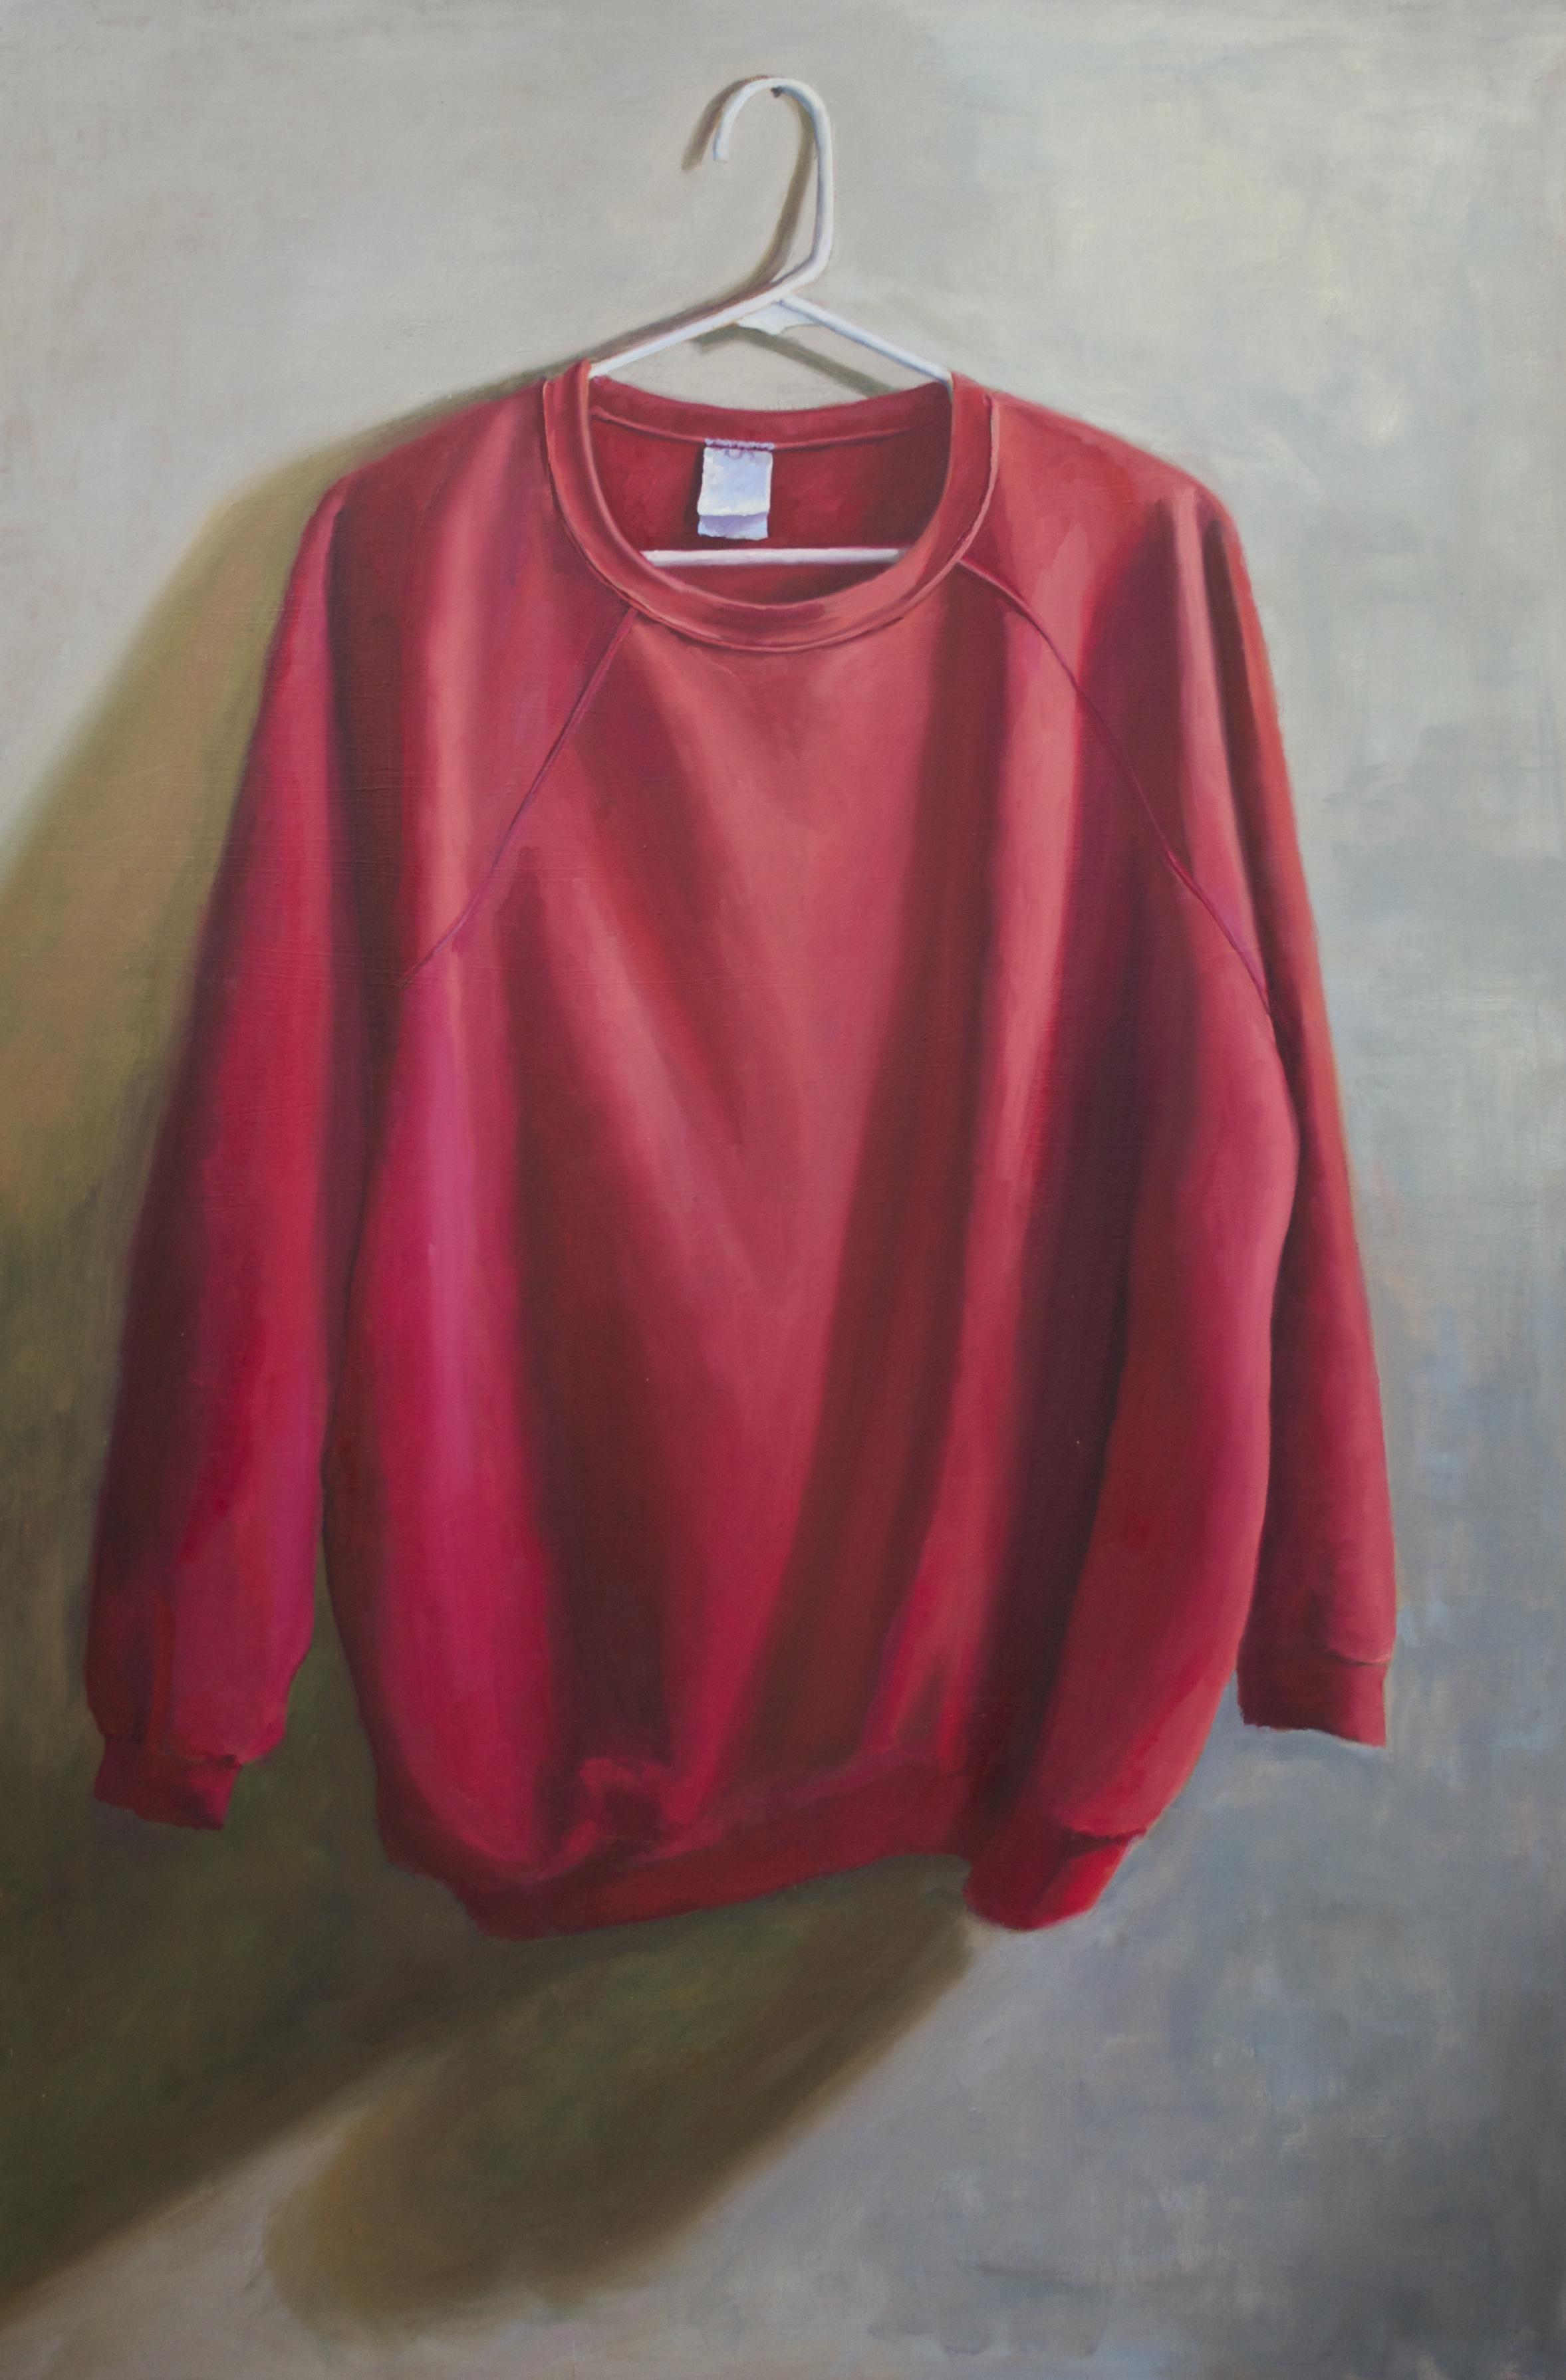 Emmalyn Tringali LCAD painting %22Her favorite sweater%22.jpg